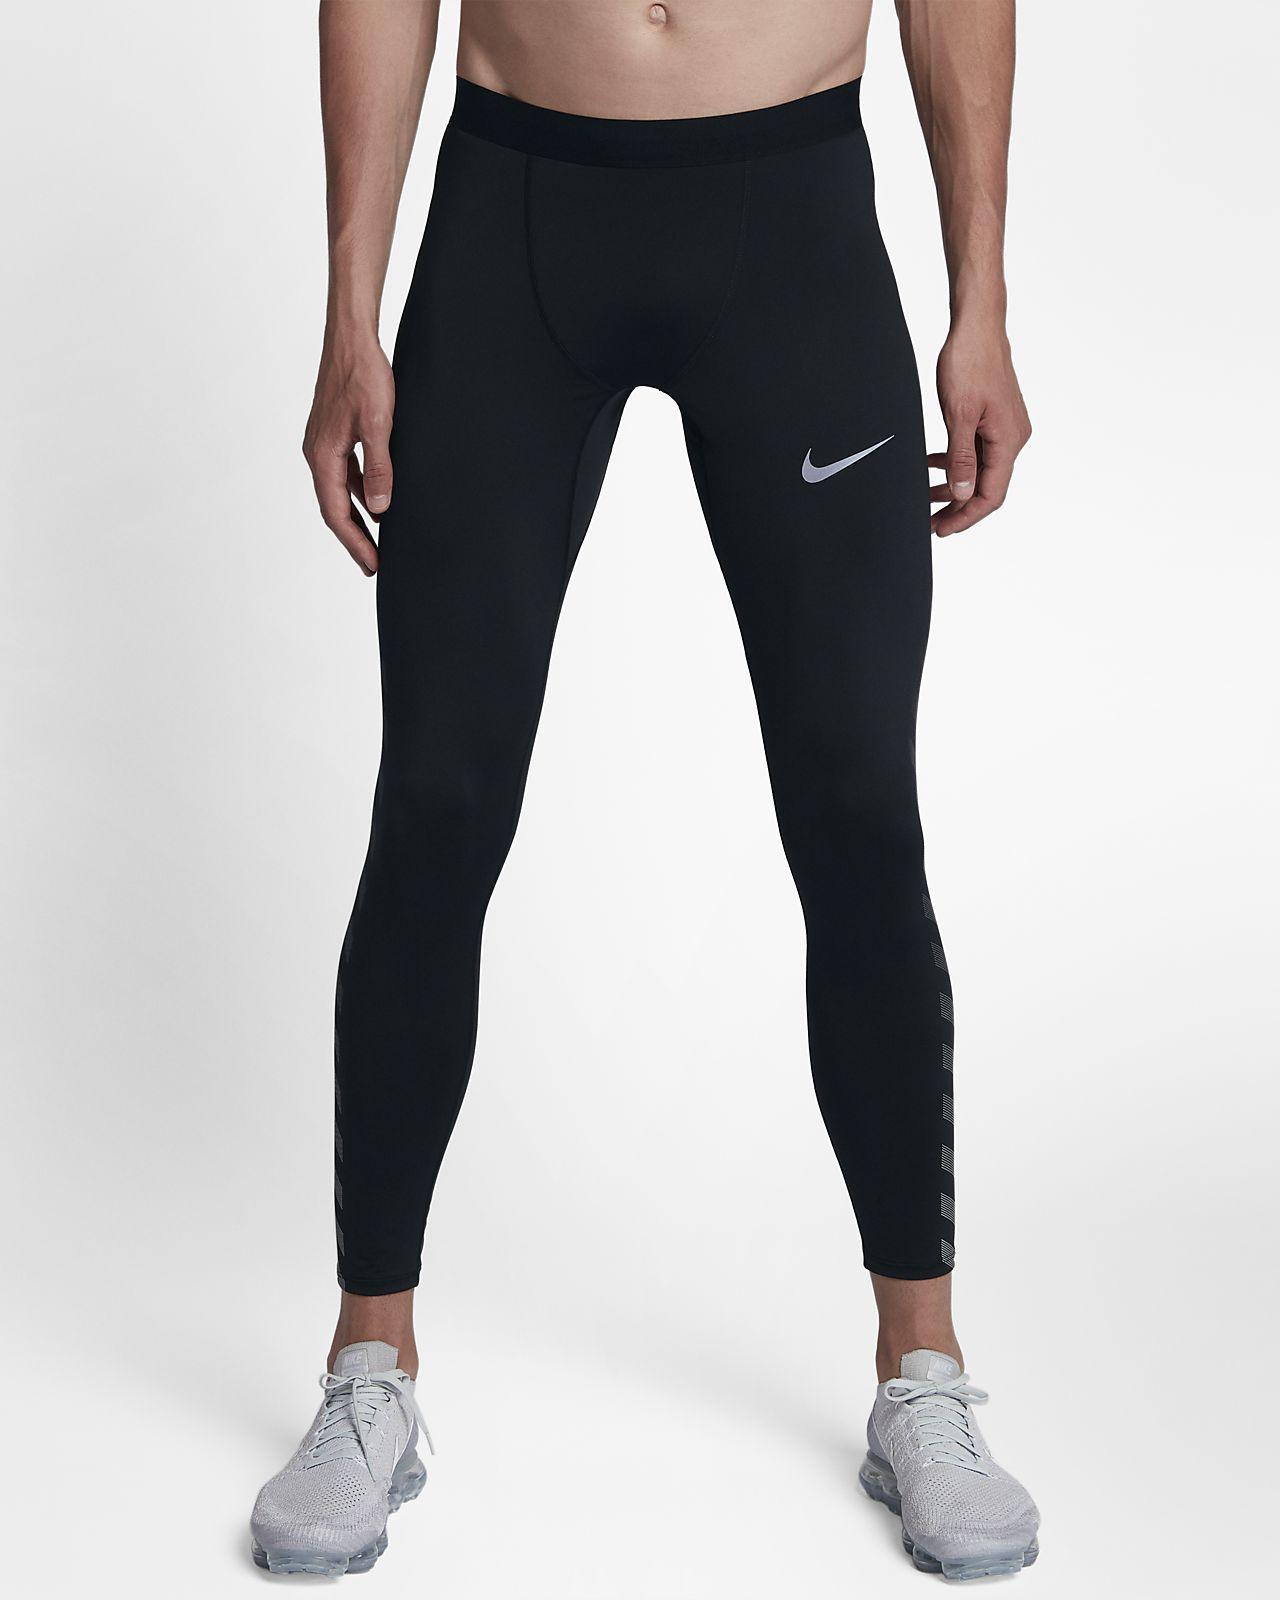 legging running homme 3f07cdaa911